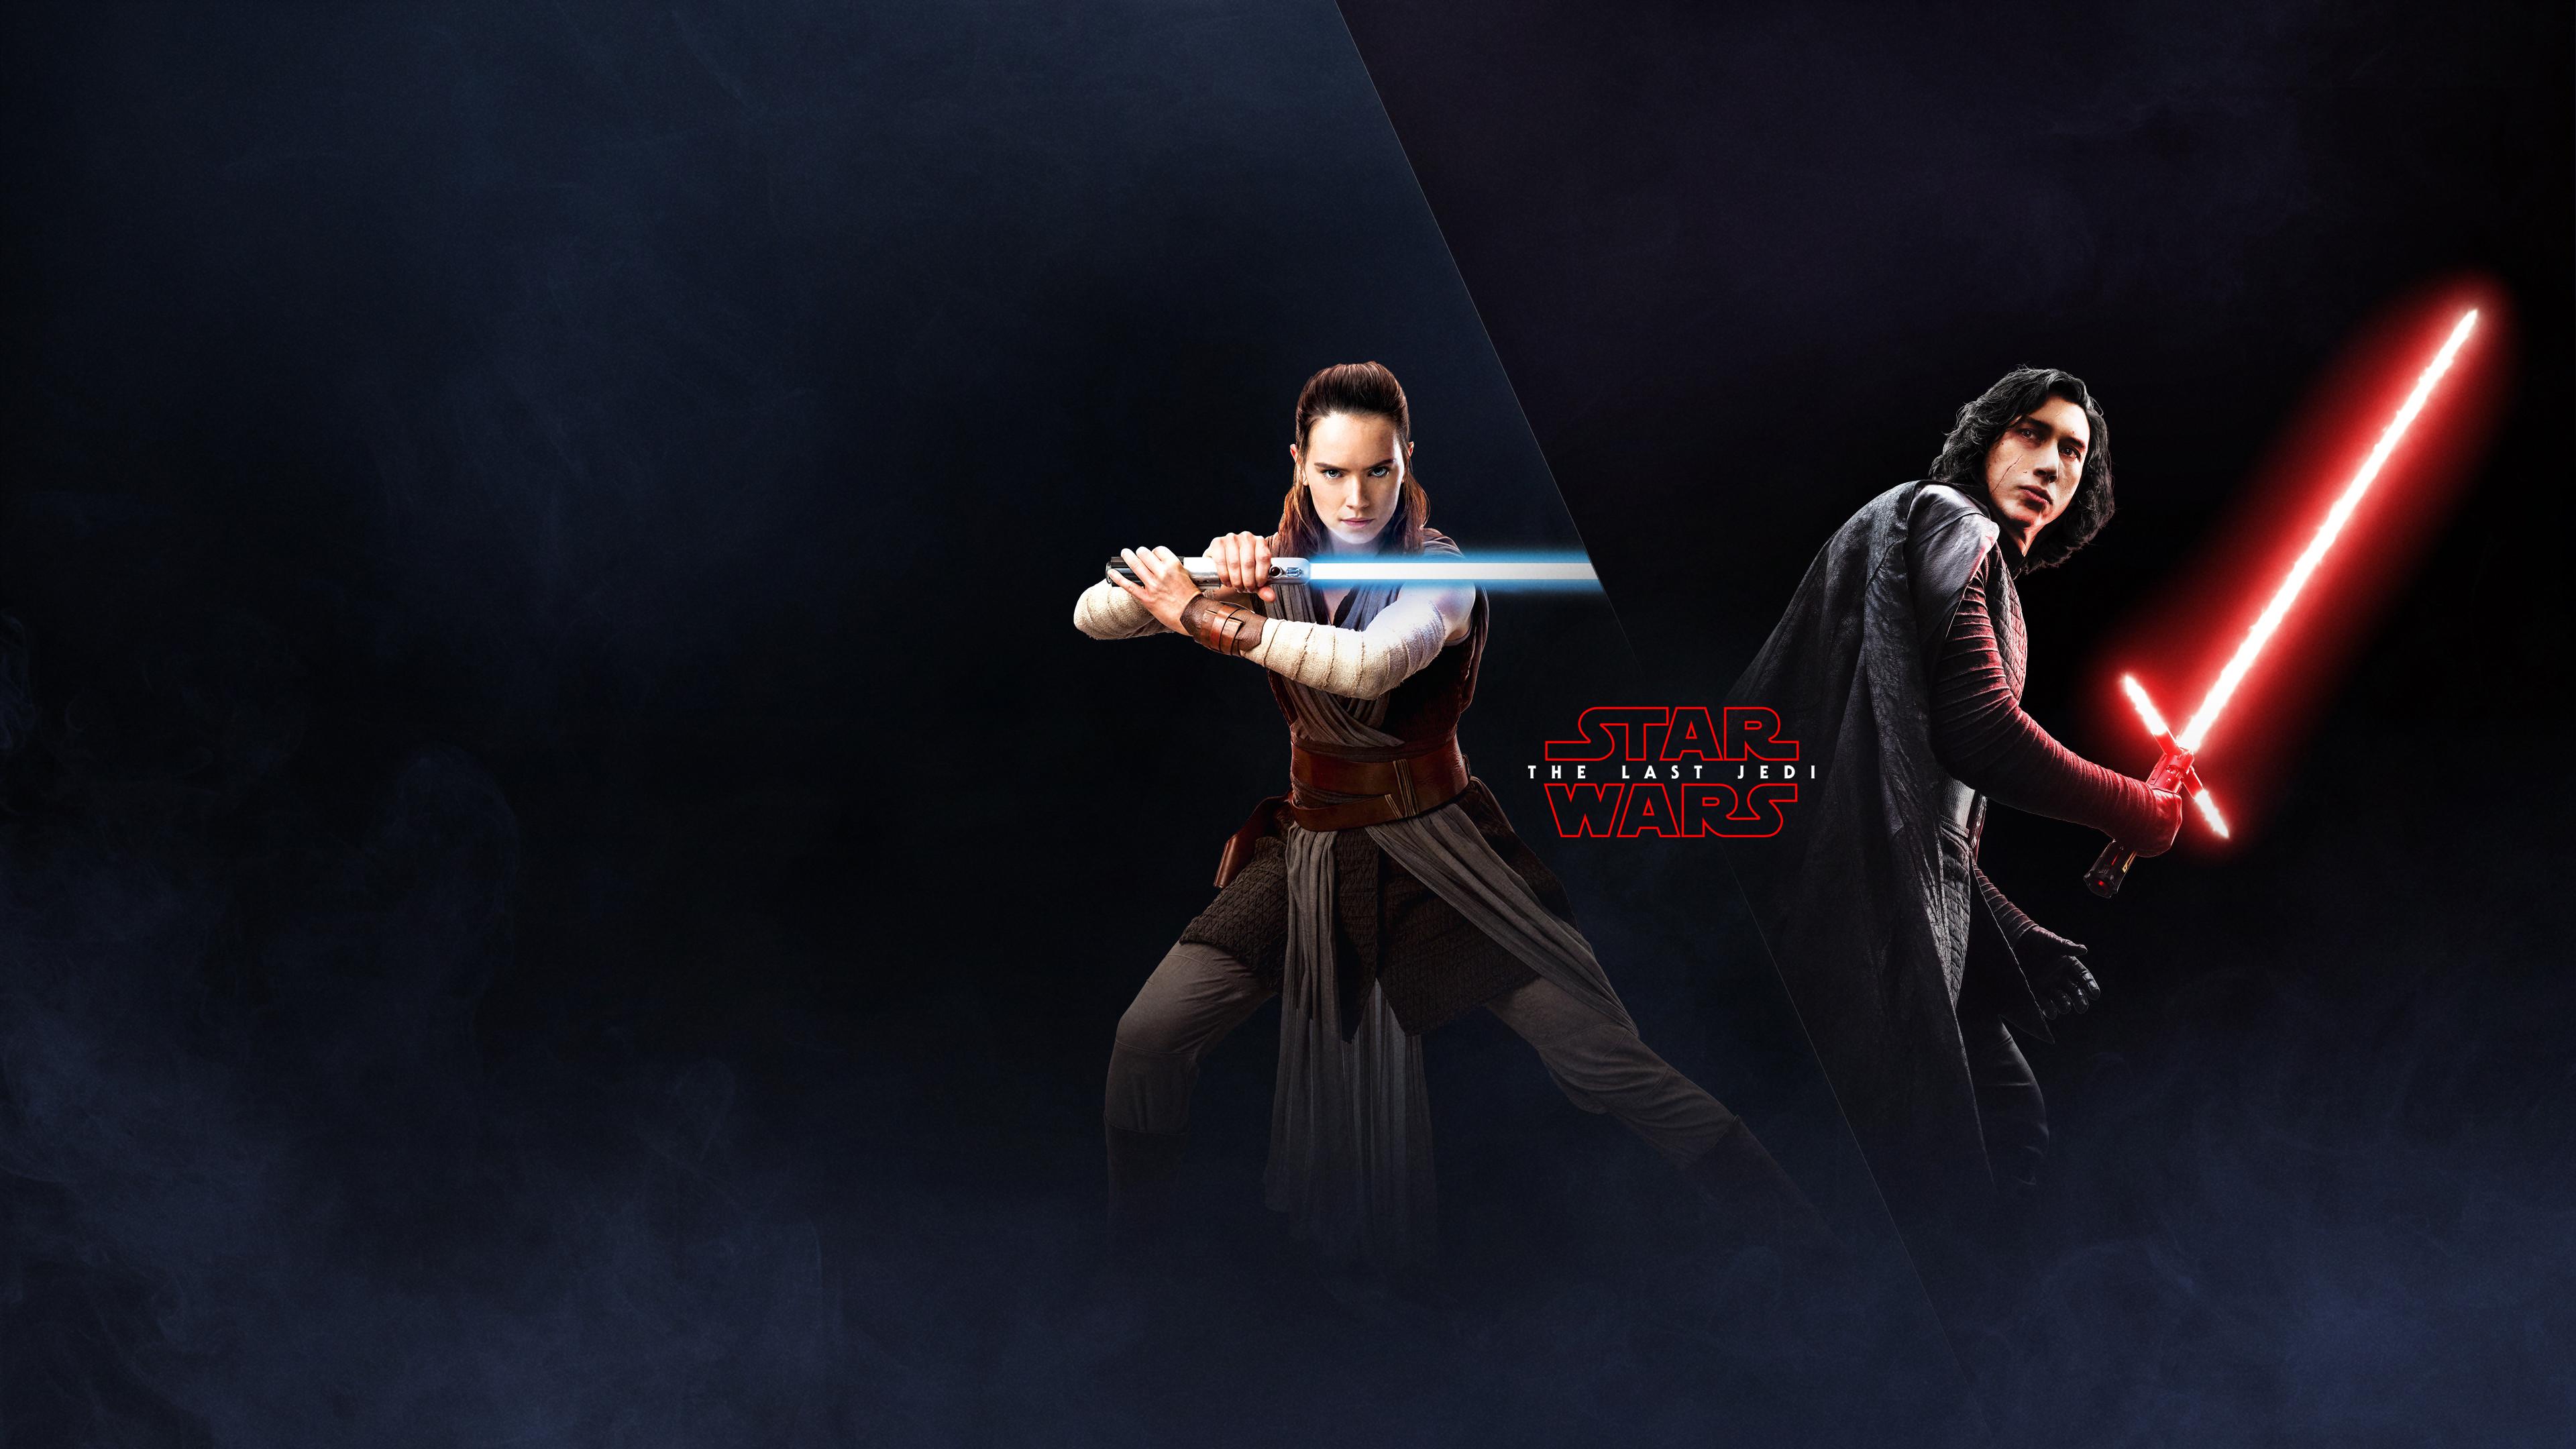 The Last Jedi Wallpaper Rey and Kylo Ren EA Battlefront 2 Poster